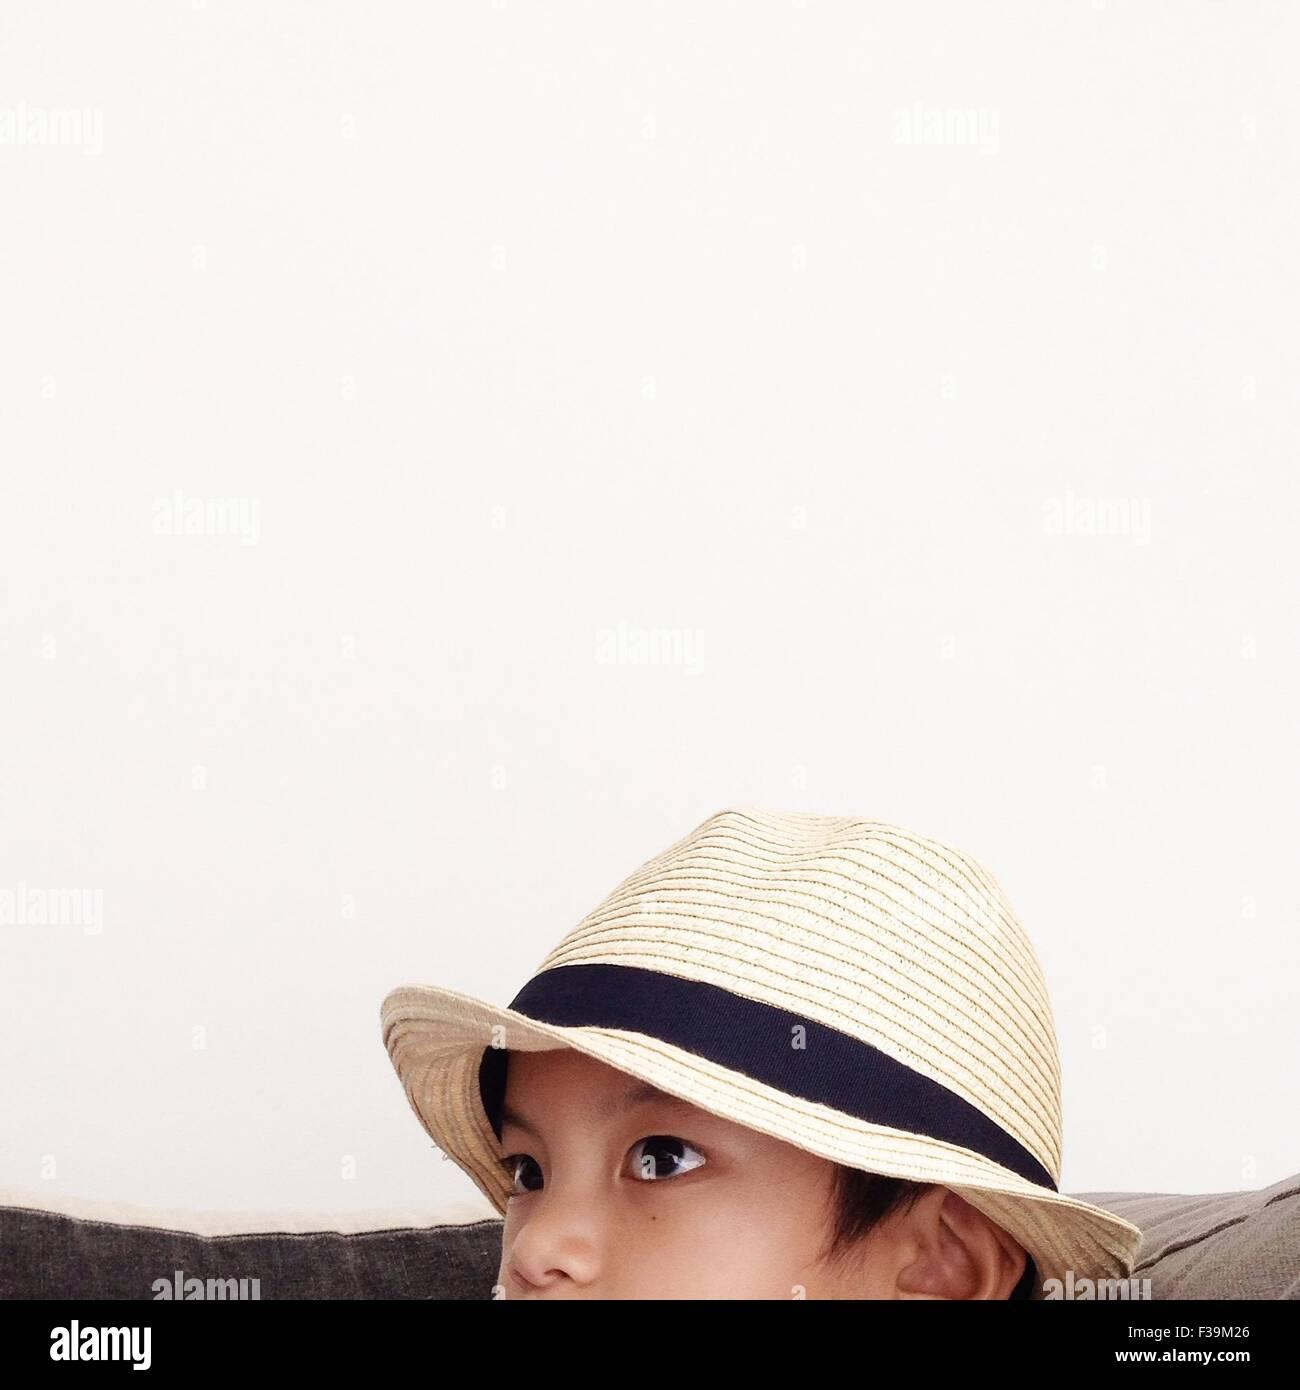 Portrait of a Boy wearing straw hat Photo Stock